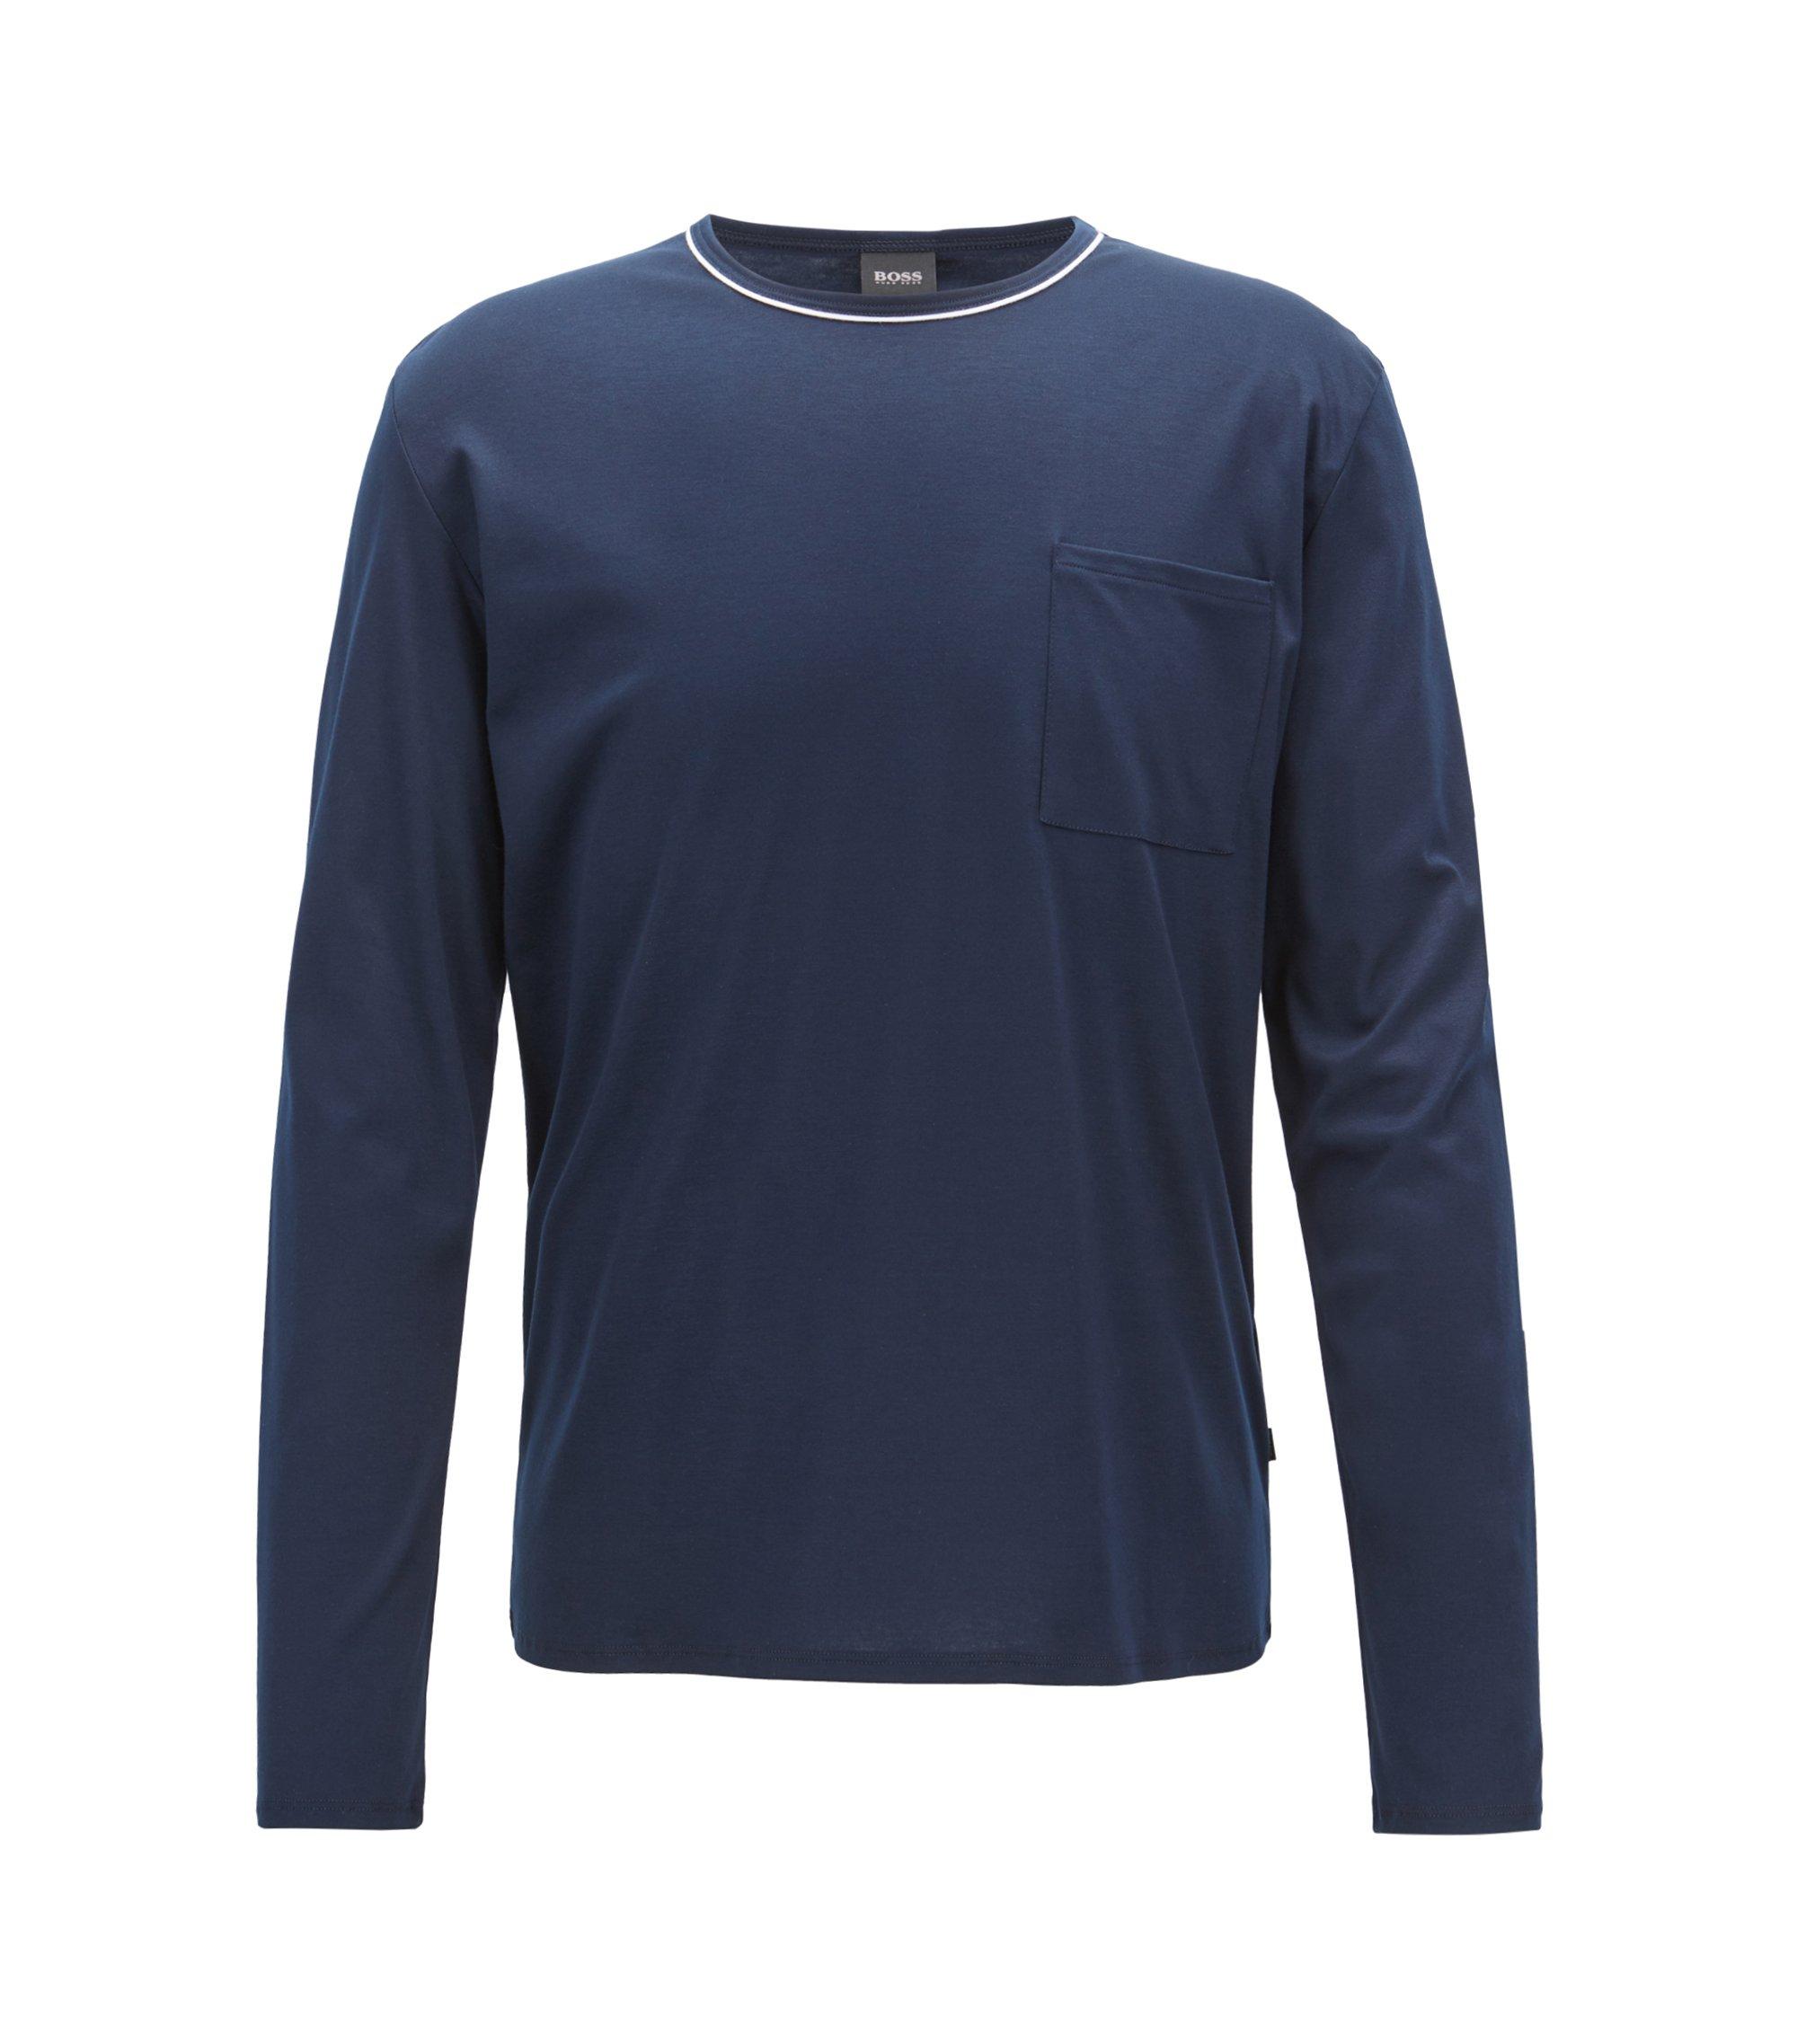 Pyjama-Top aus Interlock-Jersey mit Modal, Dunkelblau